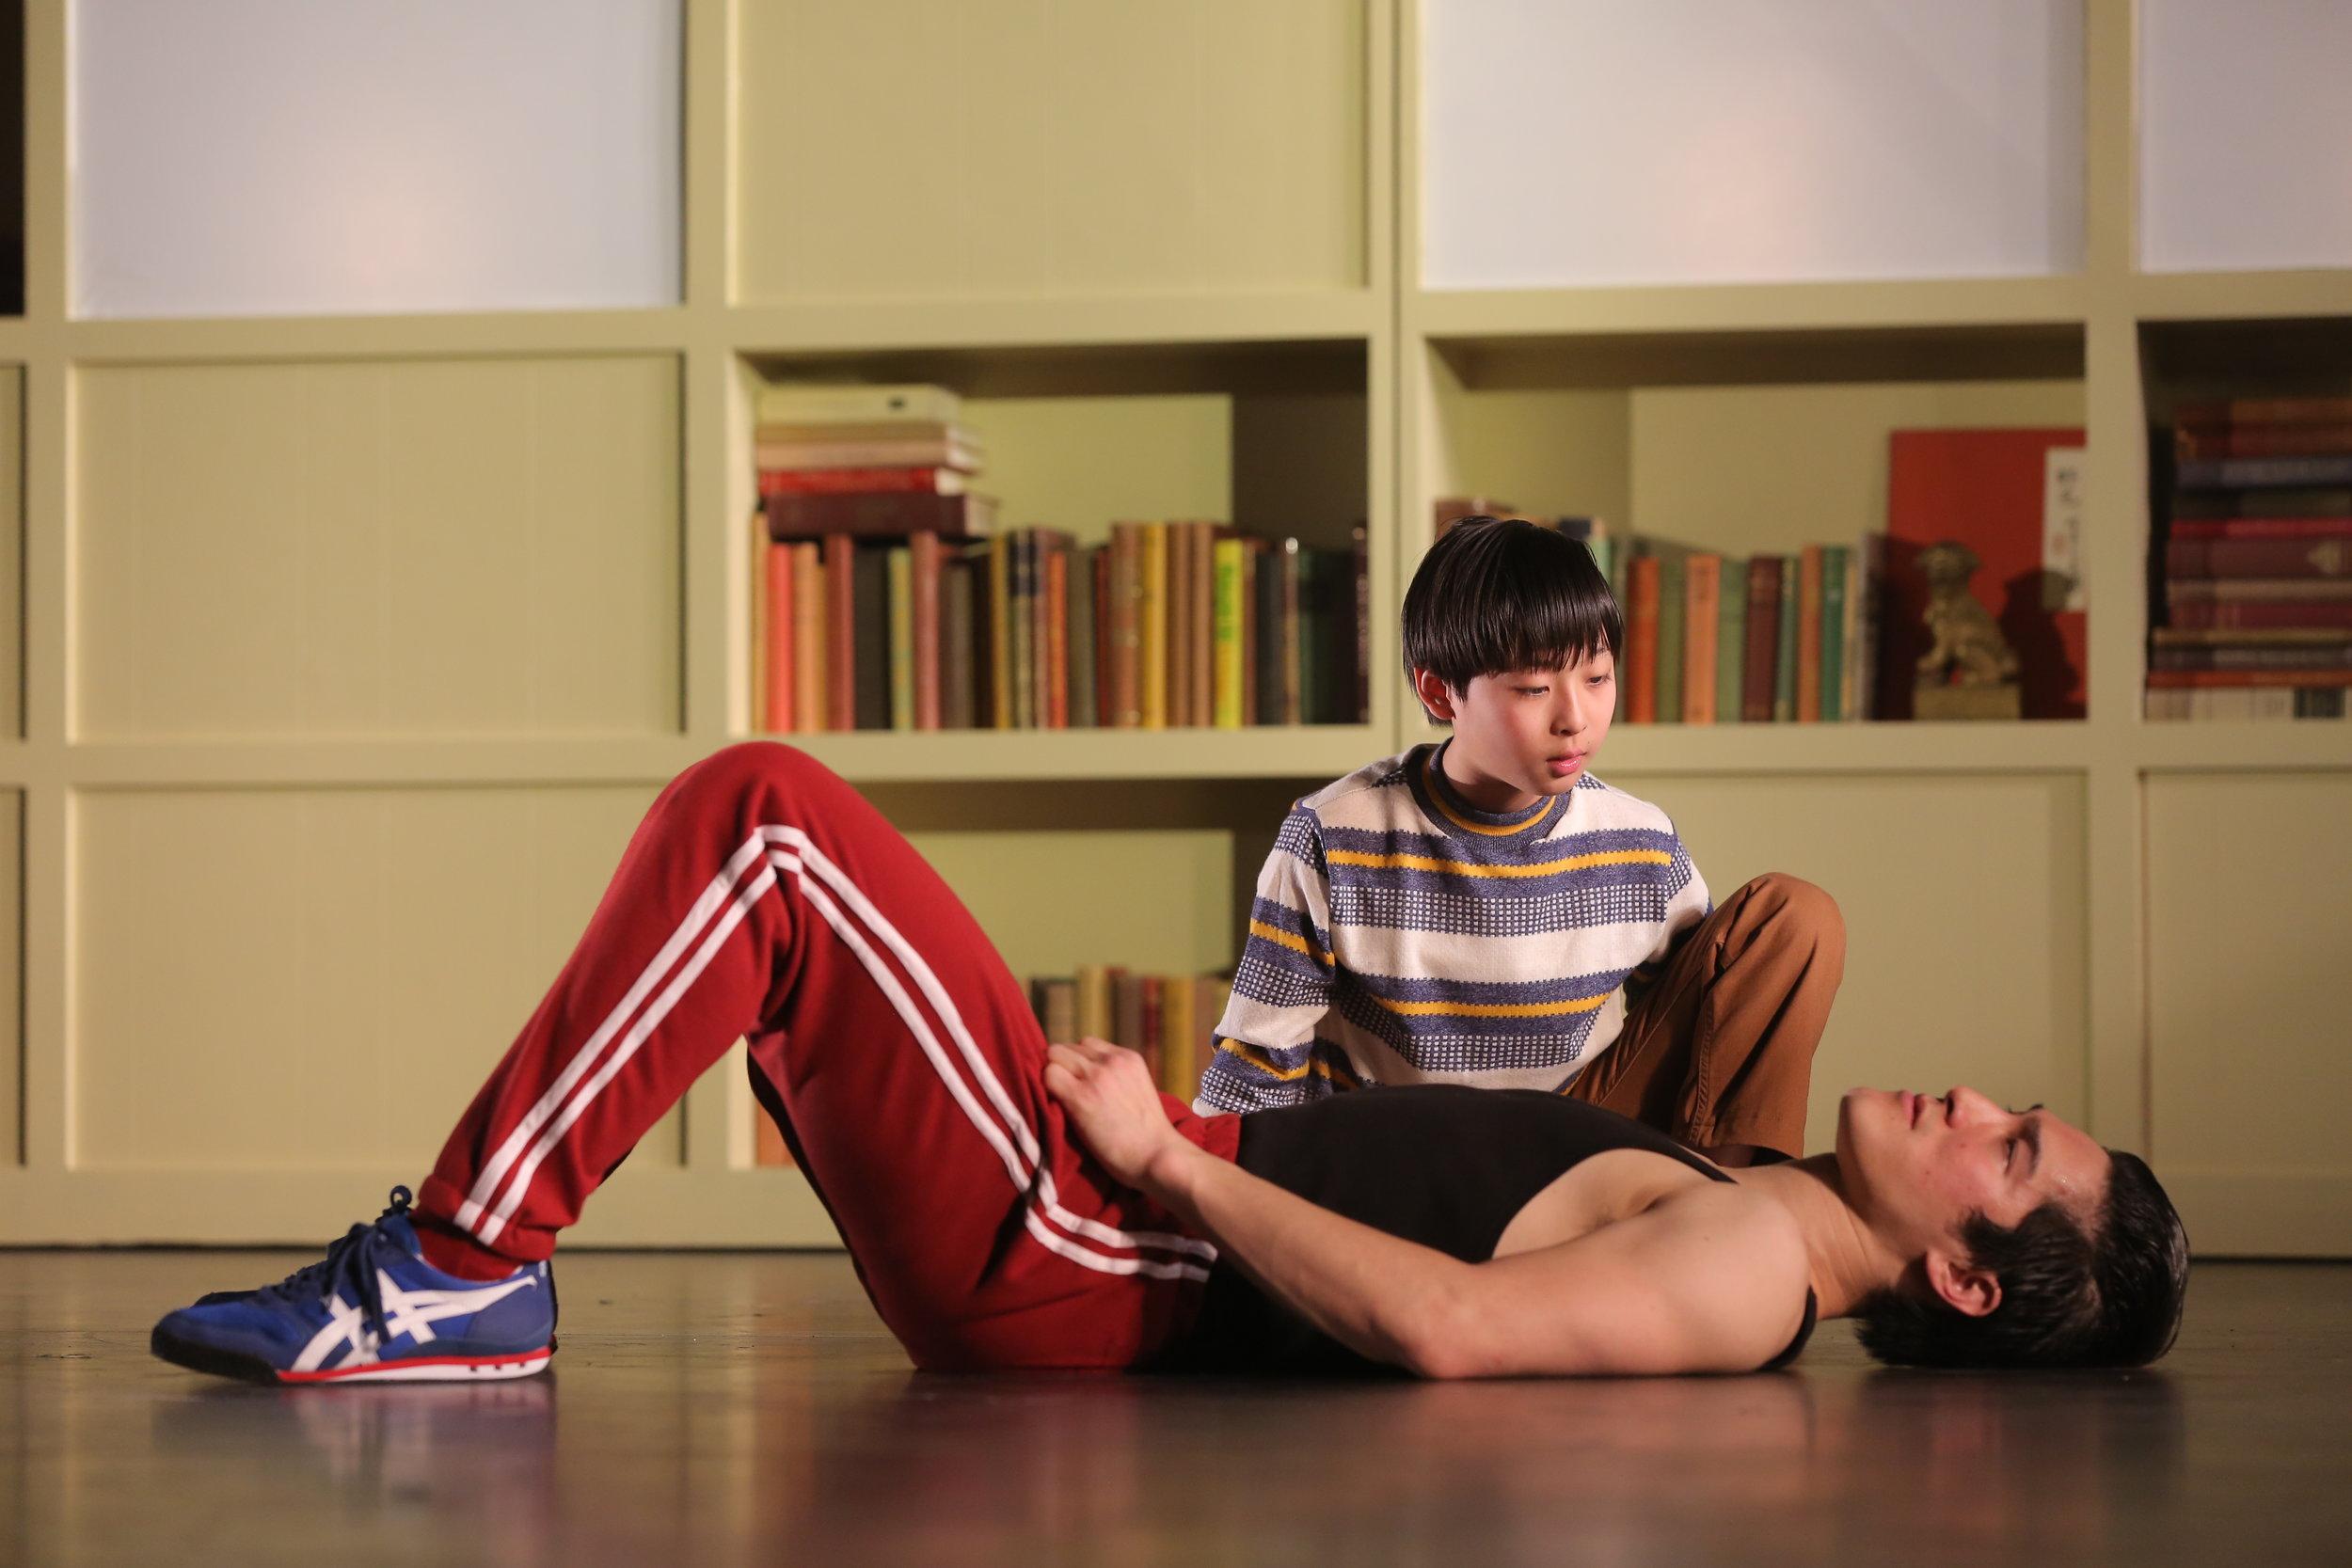 Cole Horibe 和 Bradley Fong. 图片来源: Joan Marcus,署名剧院,2014